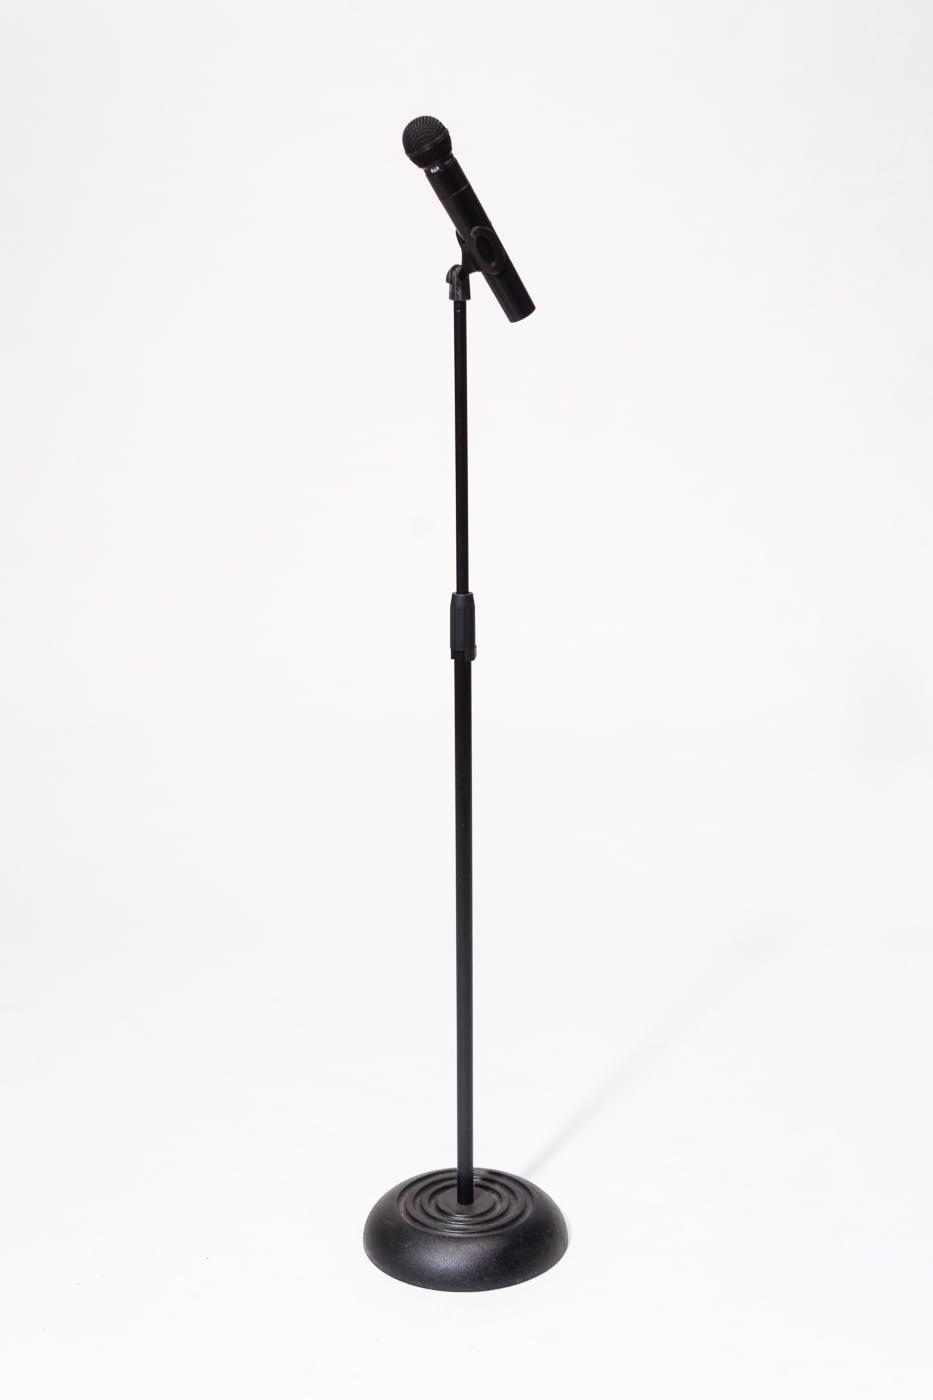 mu058 elgin wireless microphone with stand prop rental acme brooklyn. Black Bedroom Furniture Sets. Home Design Ideas